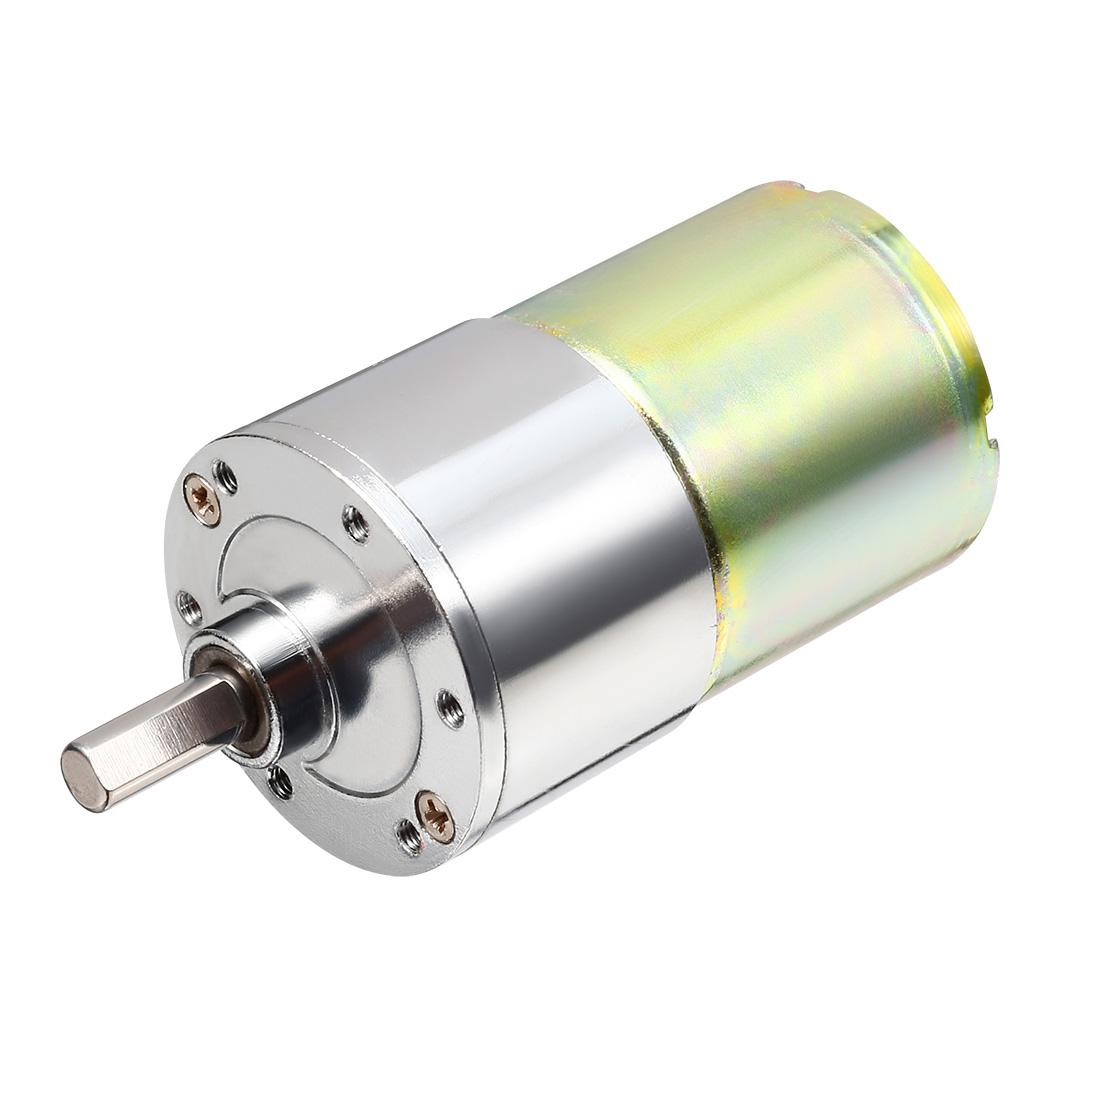 DC 24V 0.33A 15kg.cm Torque 37mm Dia Magnetic Gear Box Motor 5 RPM